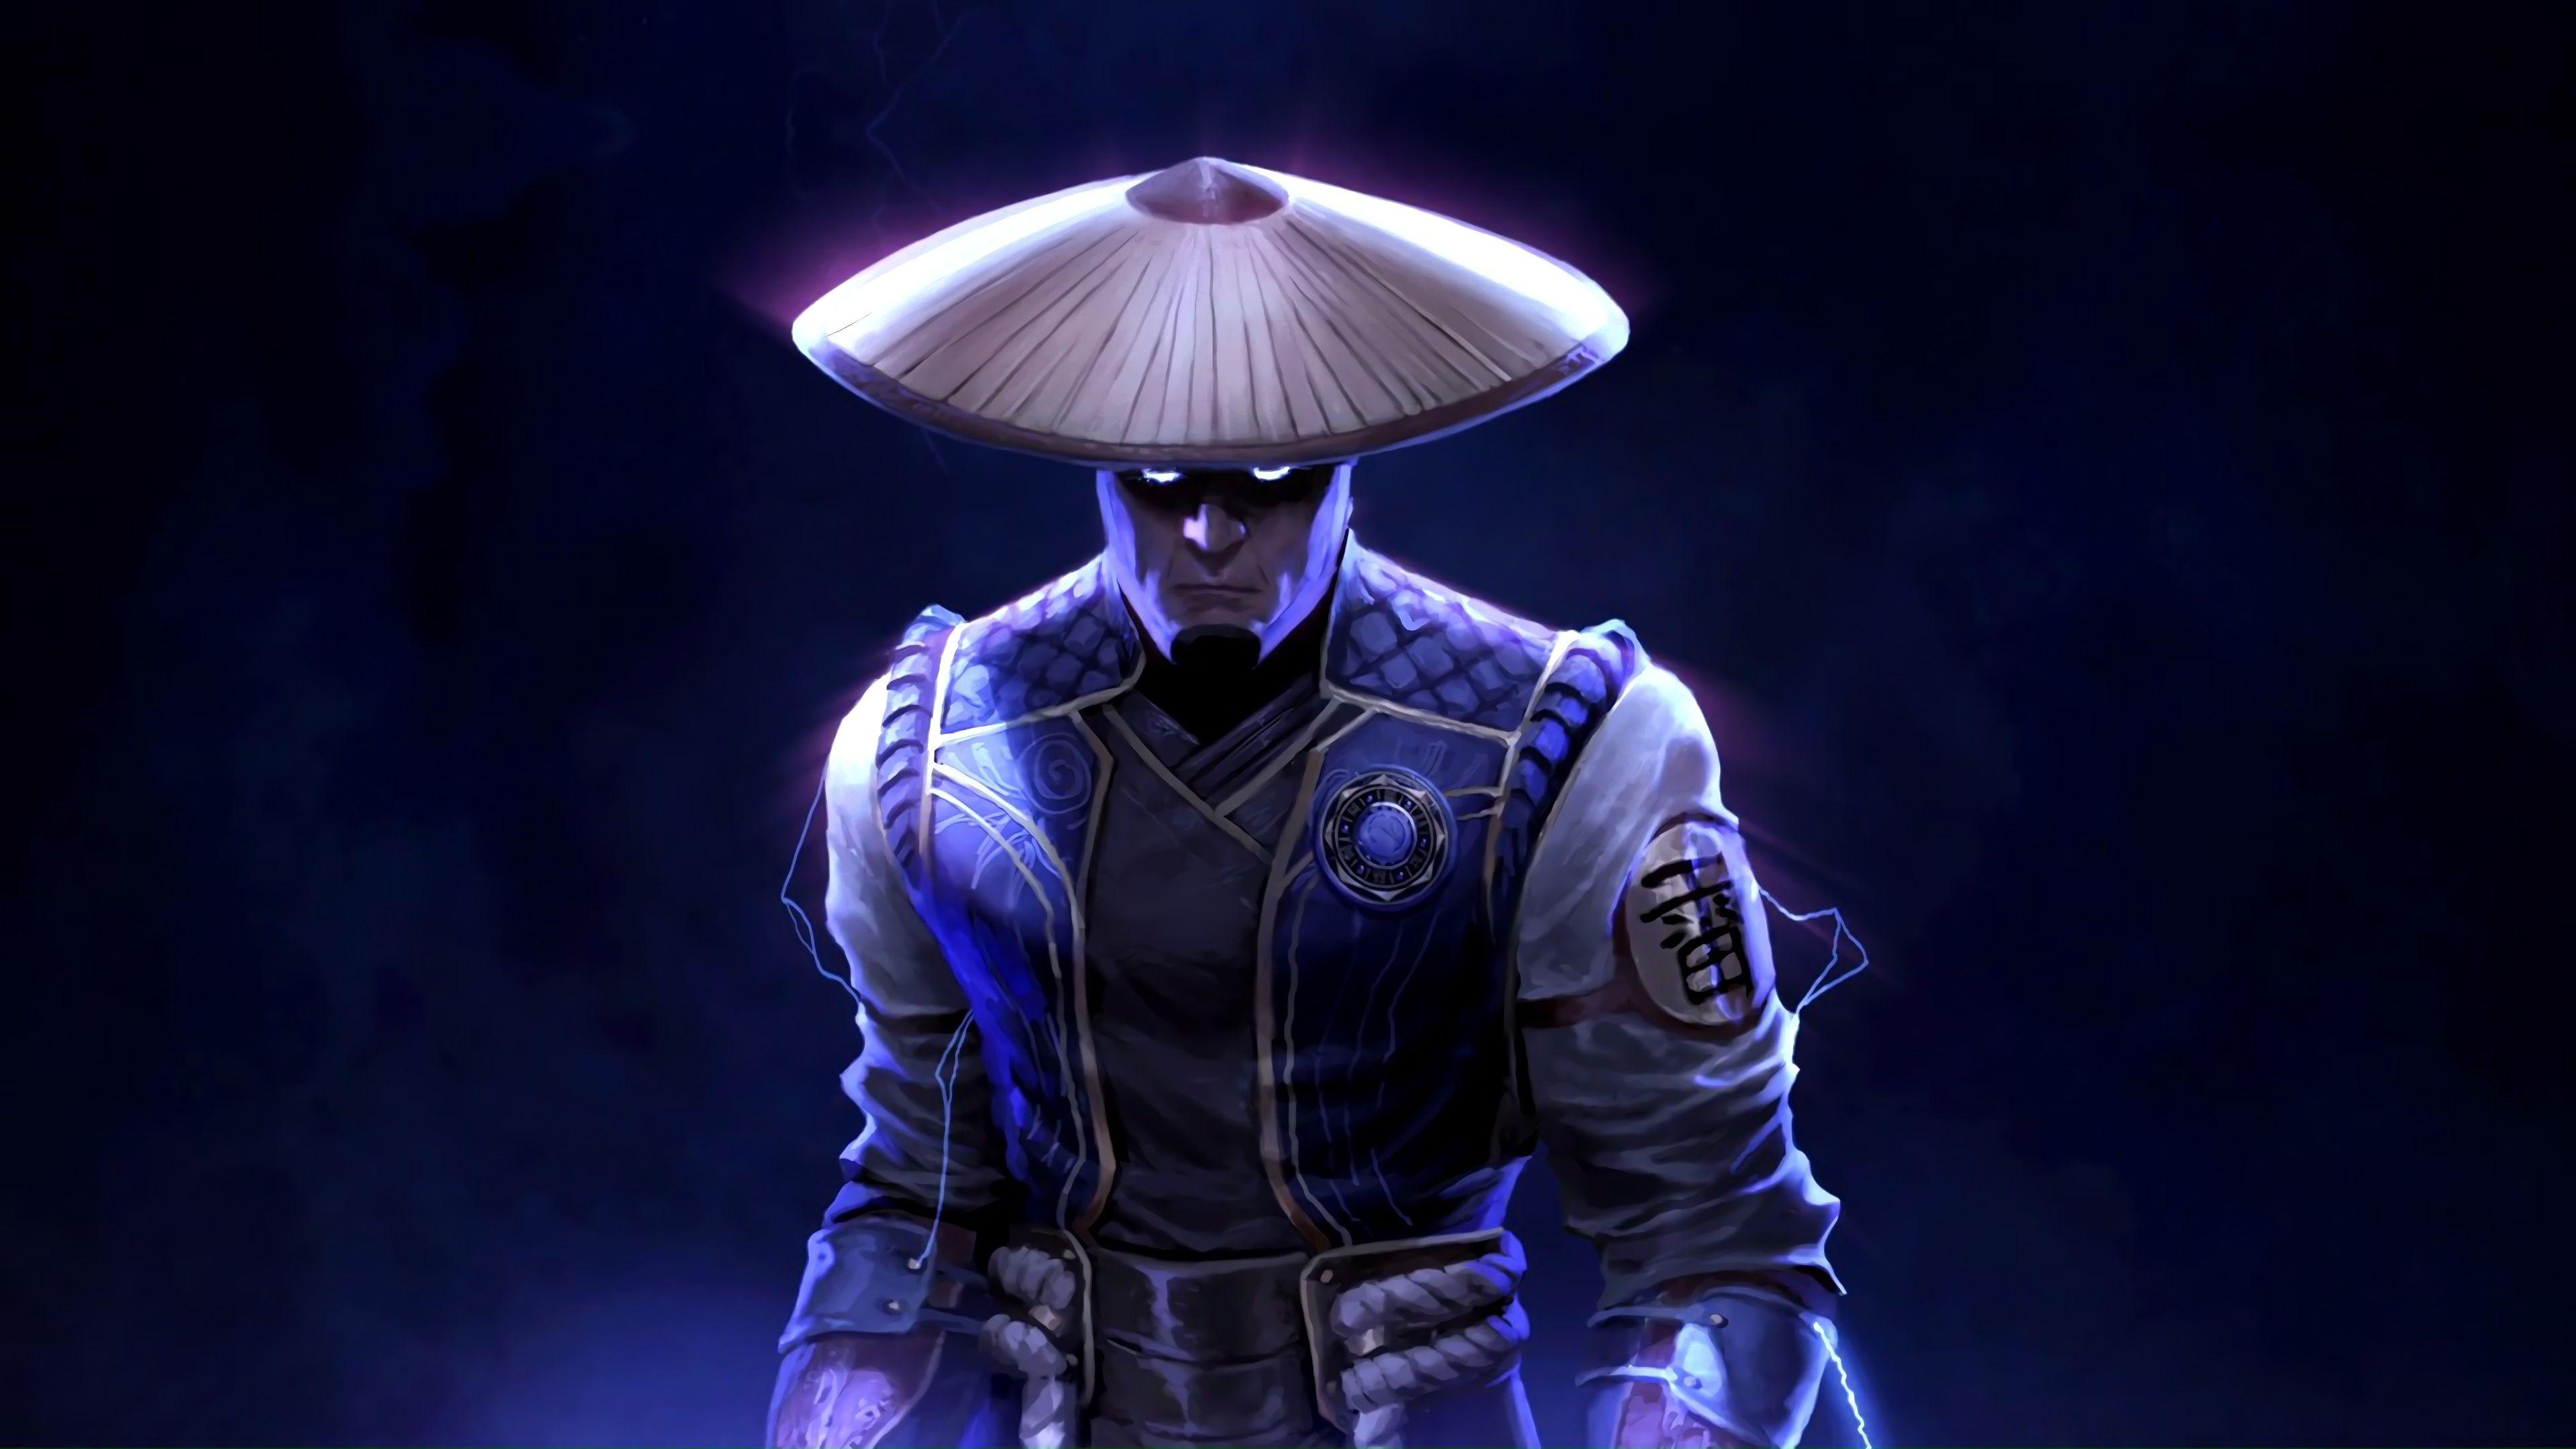 Fondos De Pantalla De Mortal Kombat Fondosmil